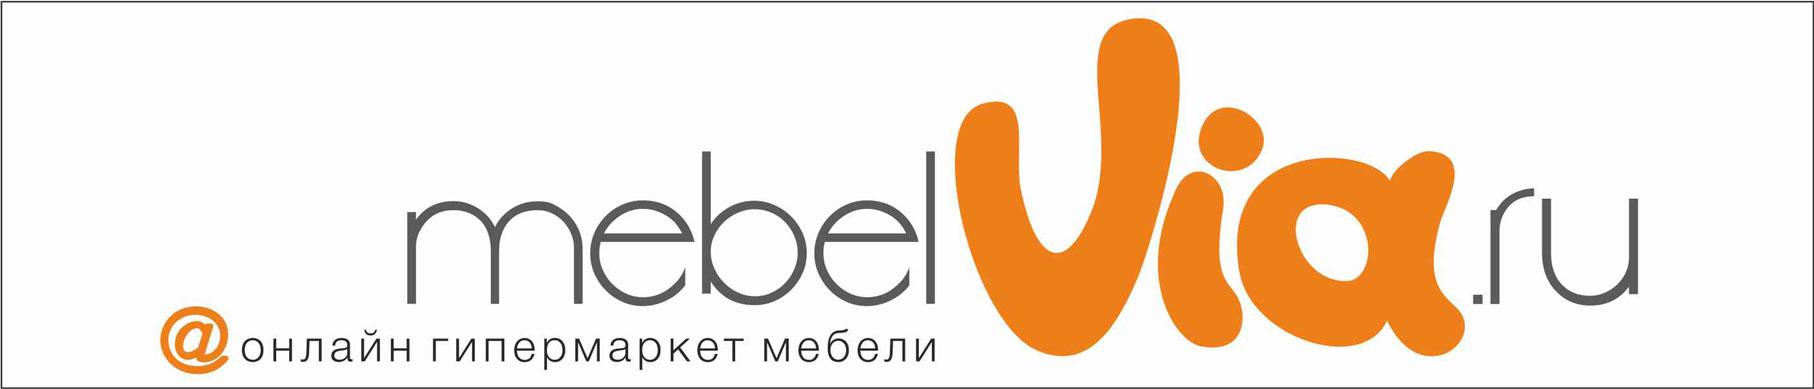 mebelVia.ru